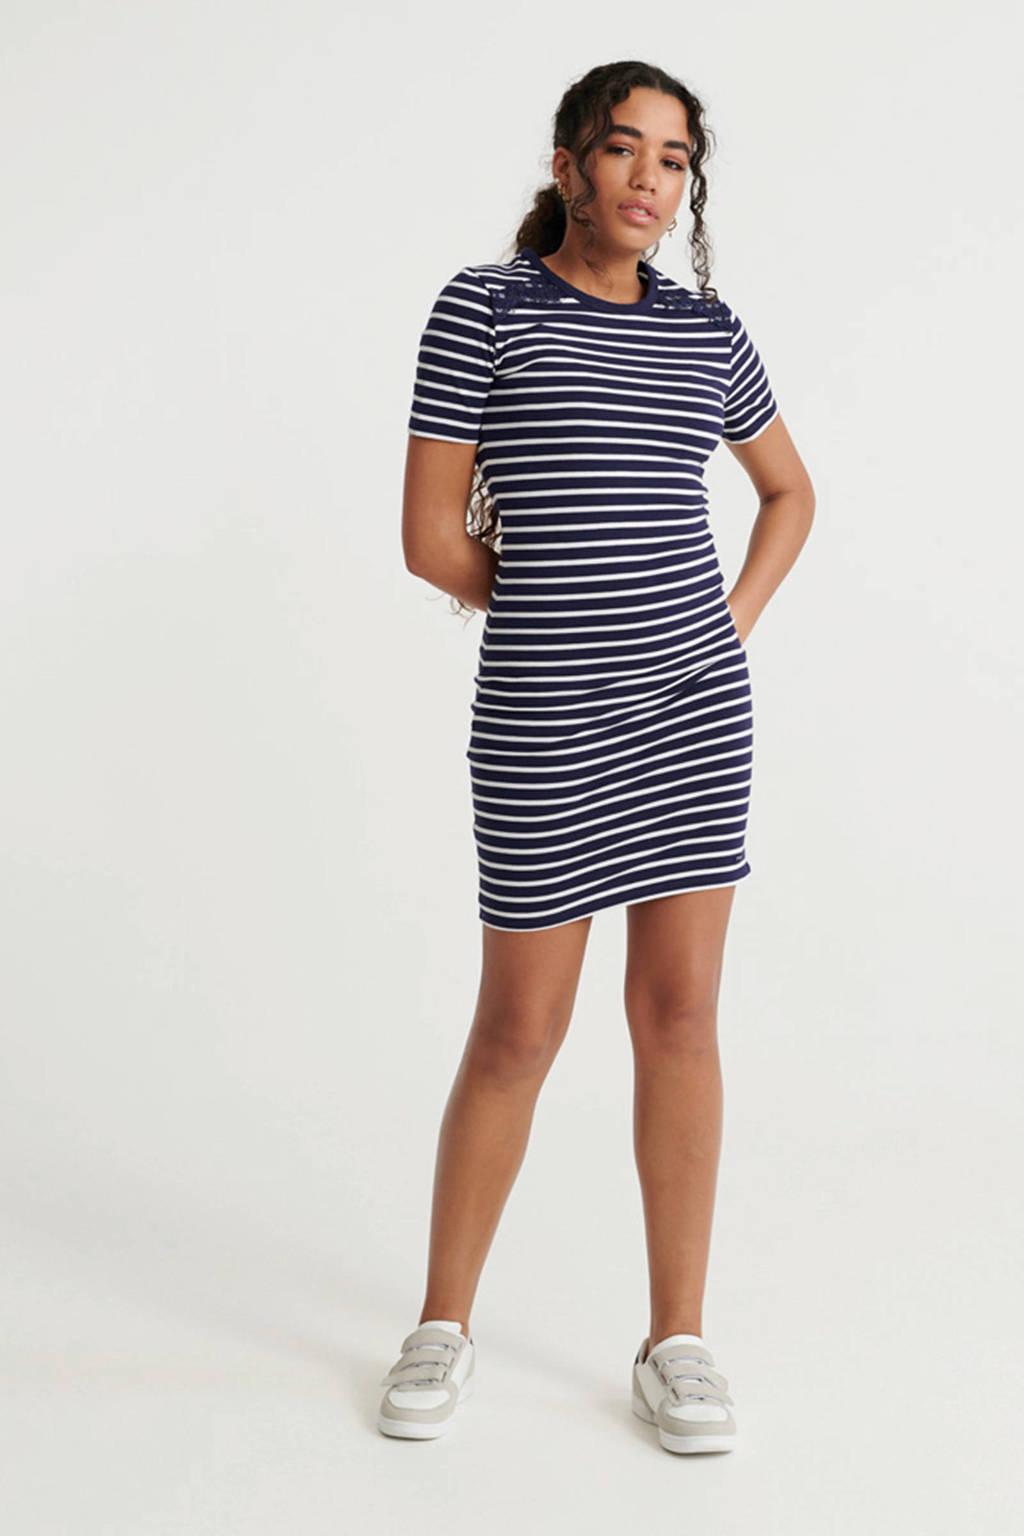 Superdry gestreepte jersey jurk donkerblauw/wit, Donkerblauw/wit